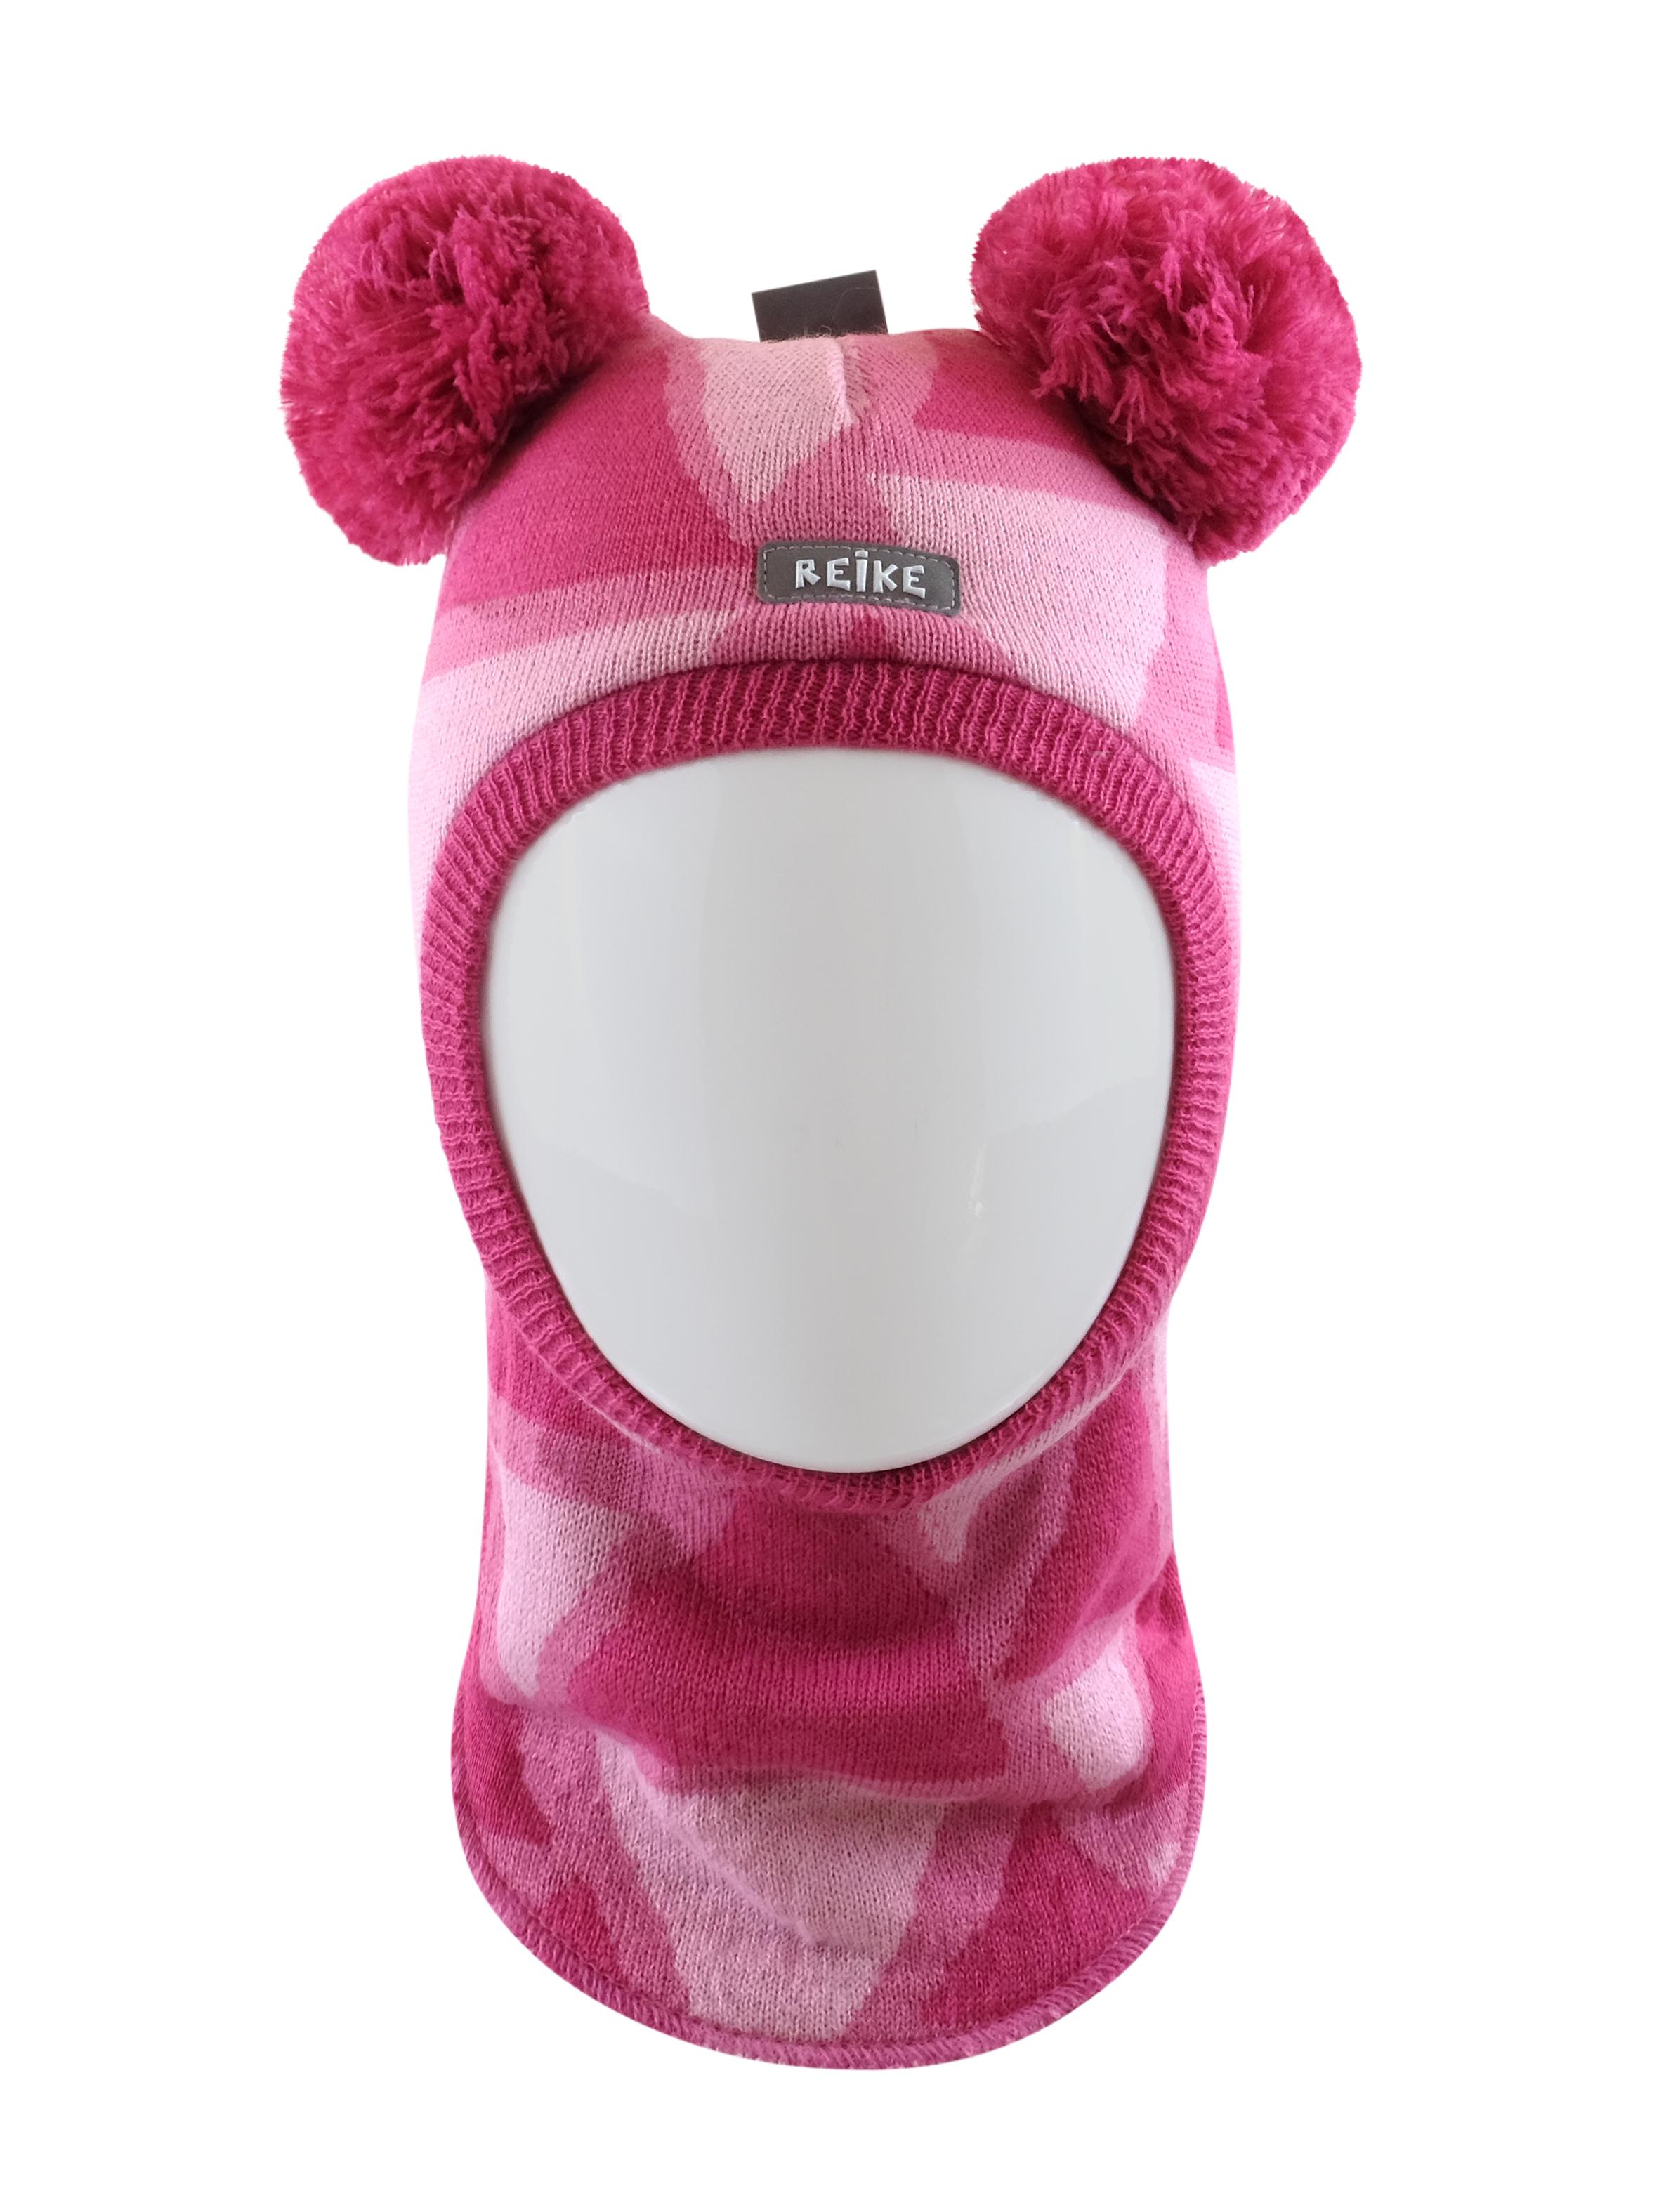 Купить Шапка-шлем для девочки Reike Bunnies fuchsia, RKN2021-1 BNS fuchsia, р.46,